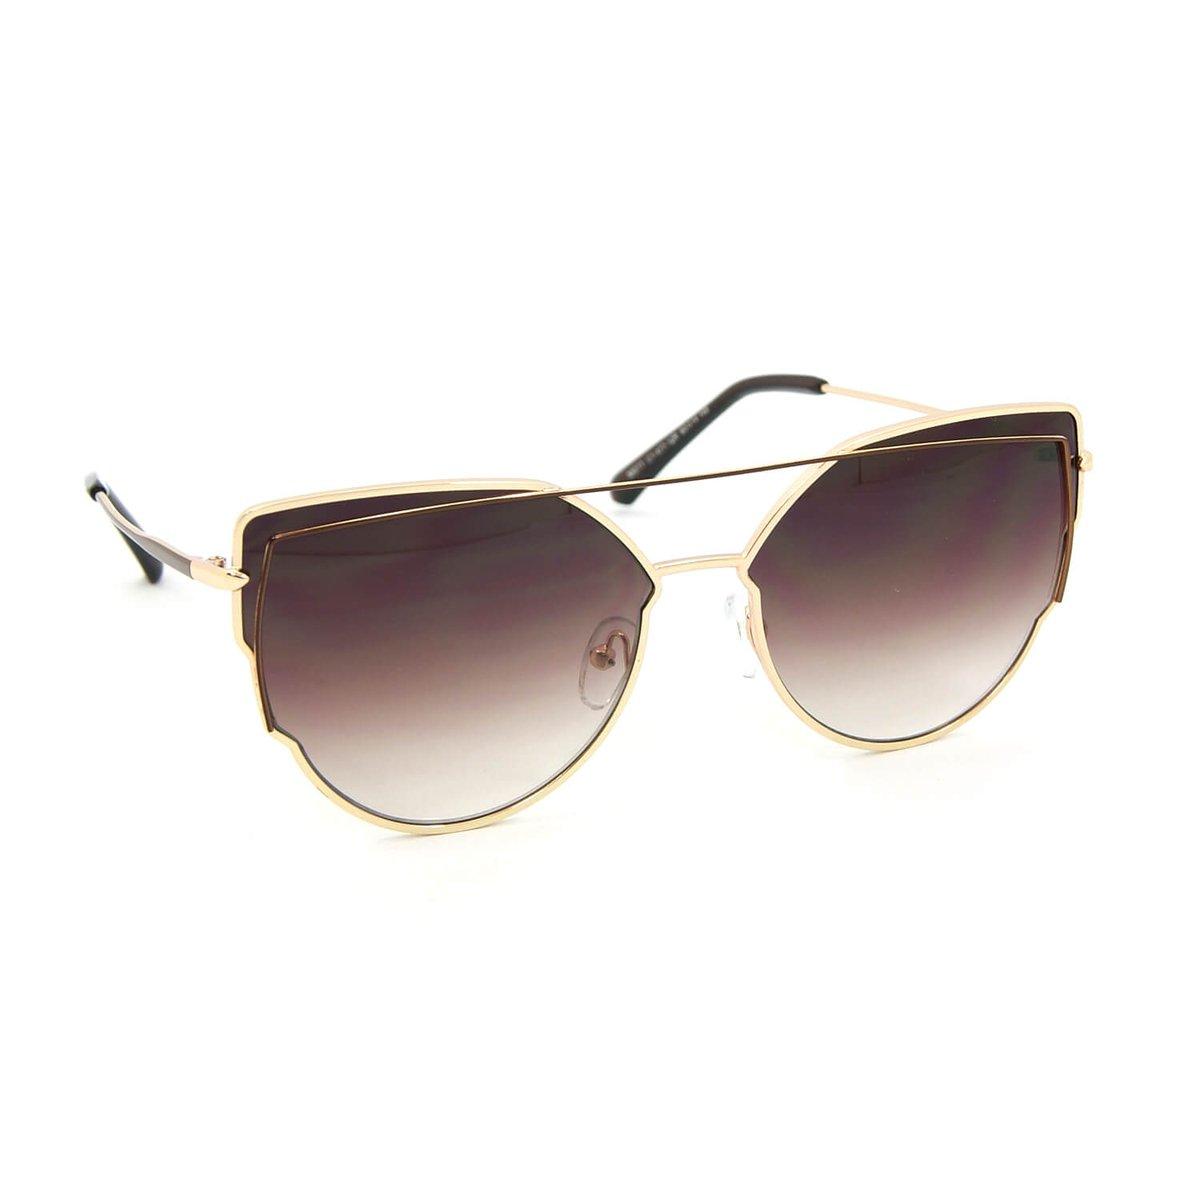 Óculos de Sol Gatinha Style Lente - Compre Agora   Zattini 7de6973c58